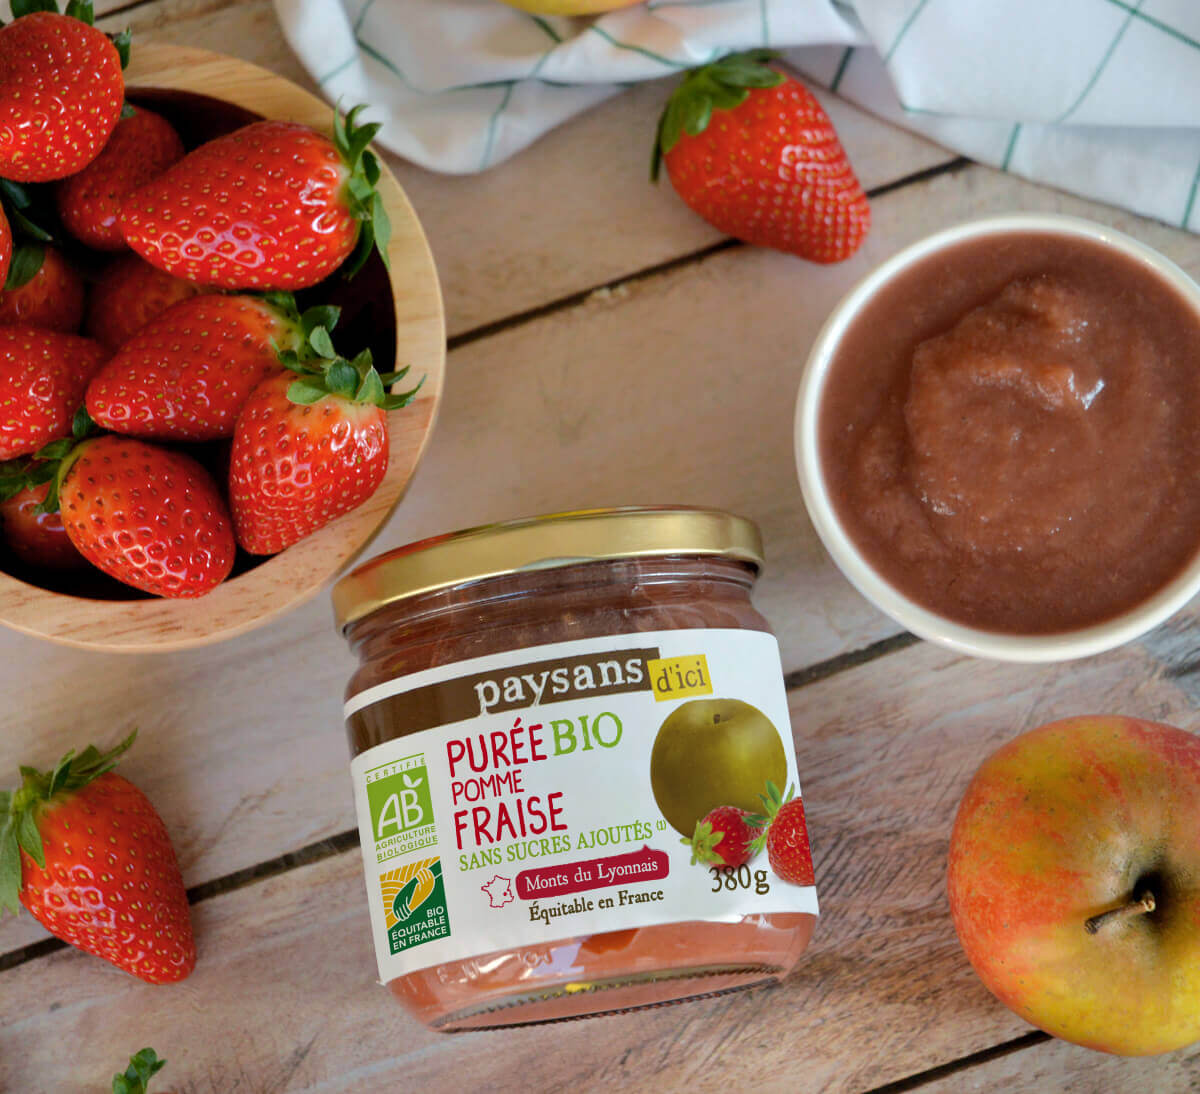 puree-pomme-fraise-bio-equitable-france